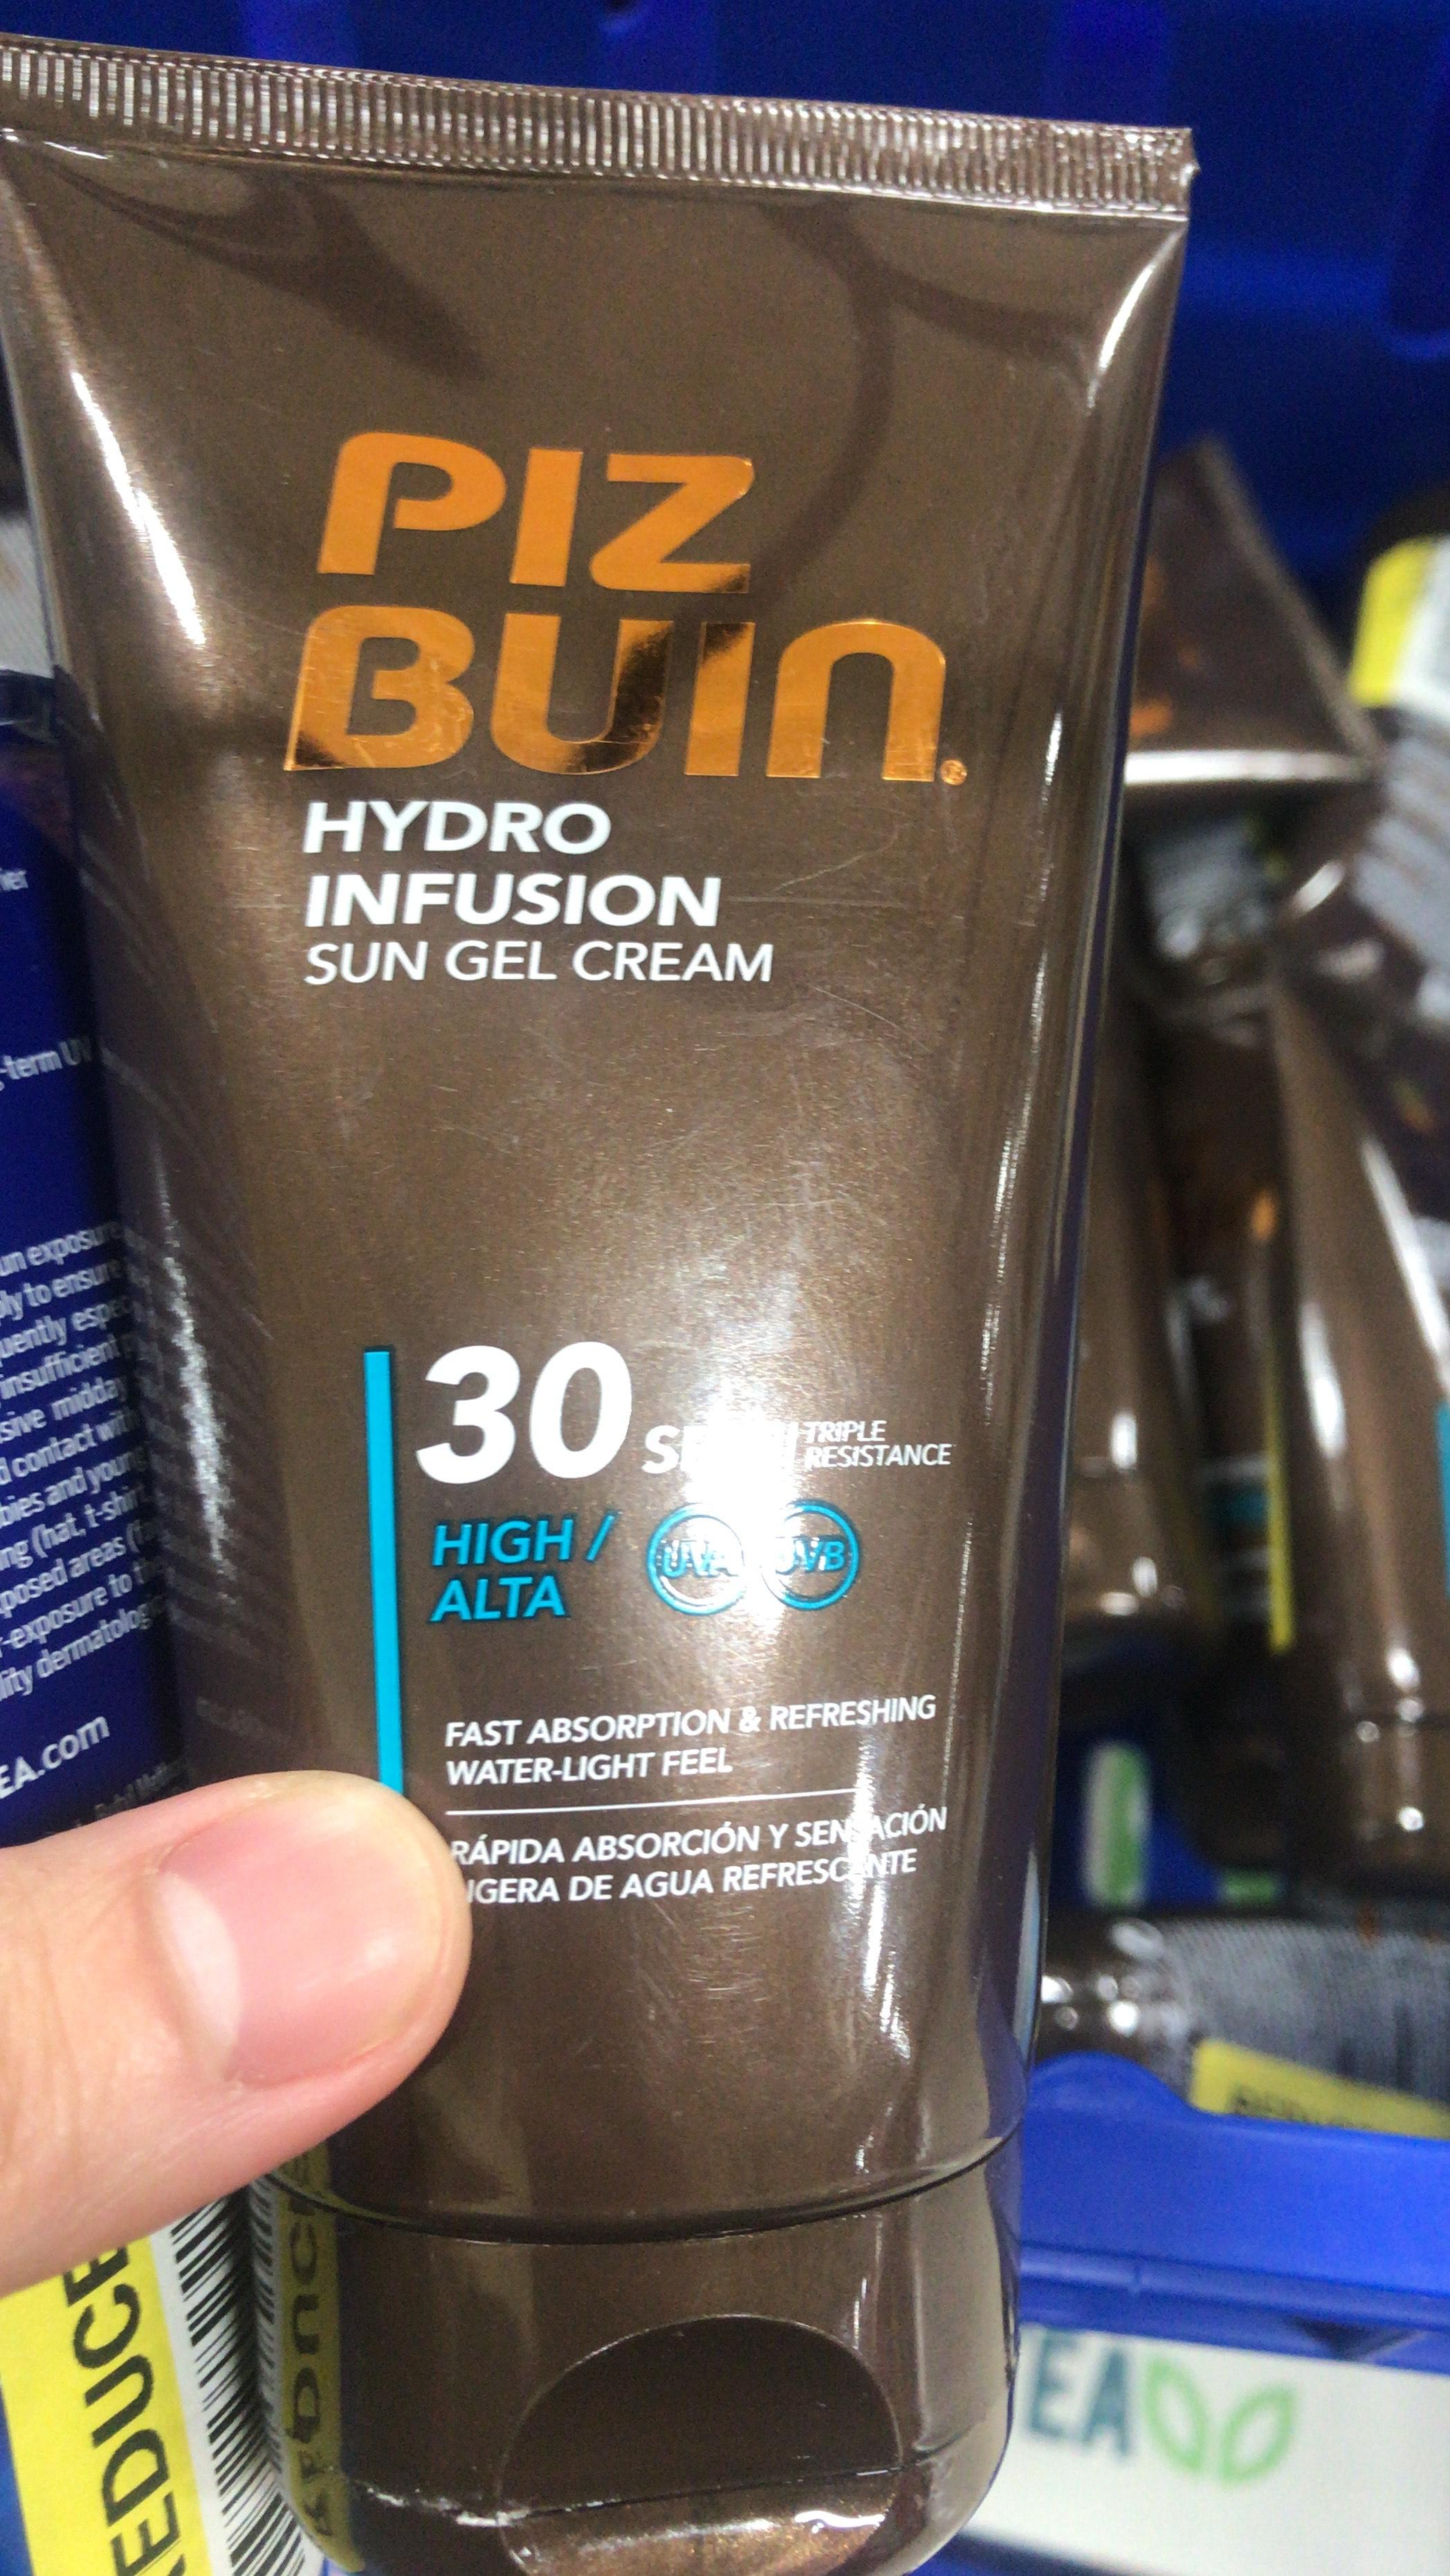 Piz Buin 30 spf sun screen £1.24 @ Tesco in store Coventry